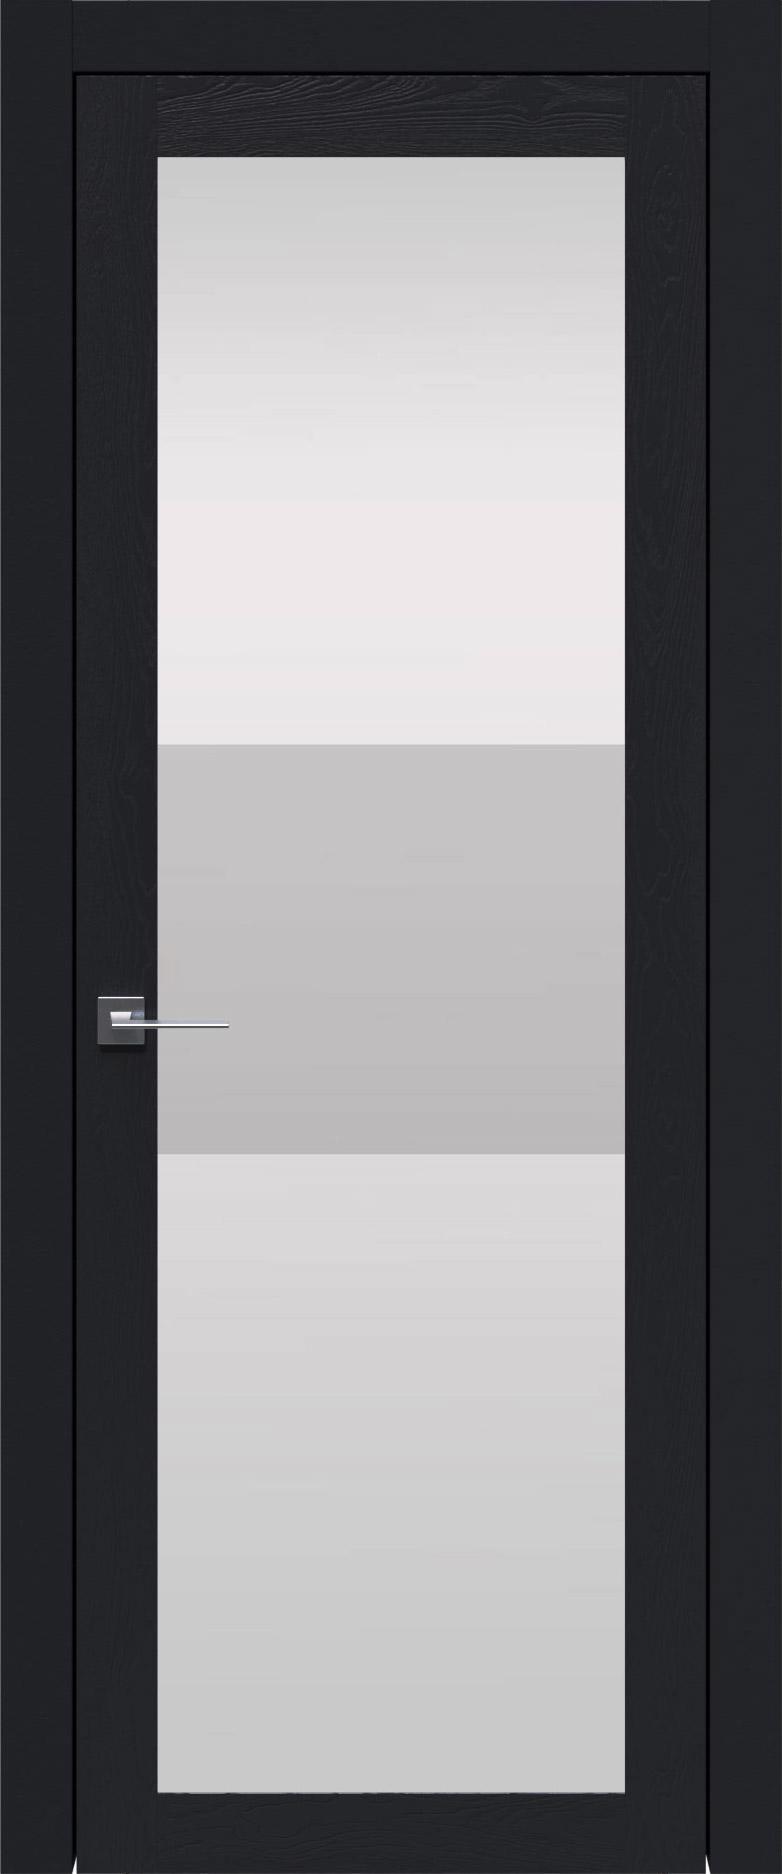 Tivoli З-4 цвет - Черная эмаль по шпону (RAL 9004) Со стеклом (ДО)